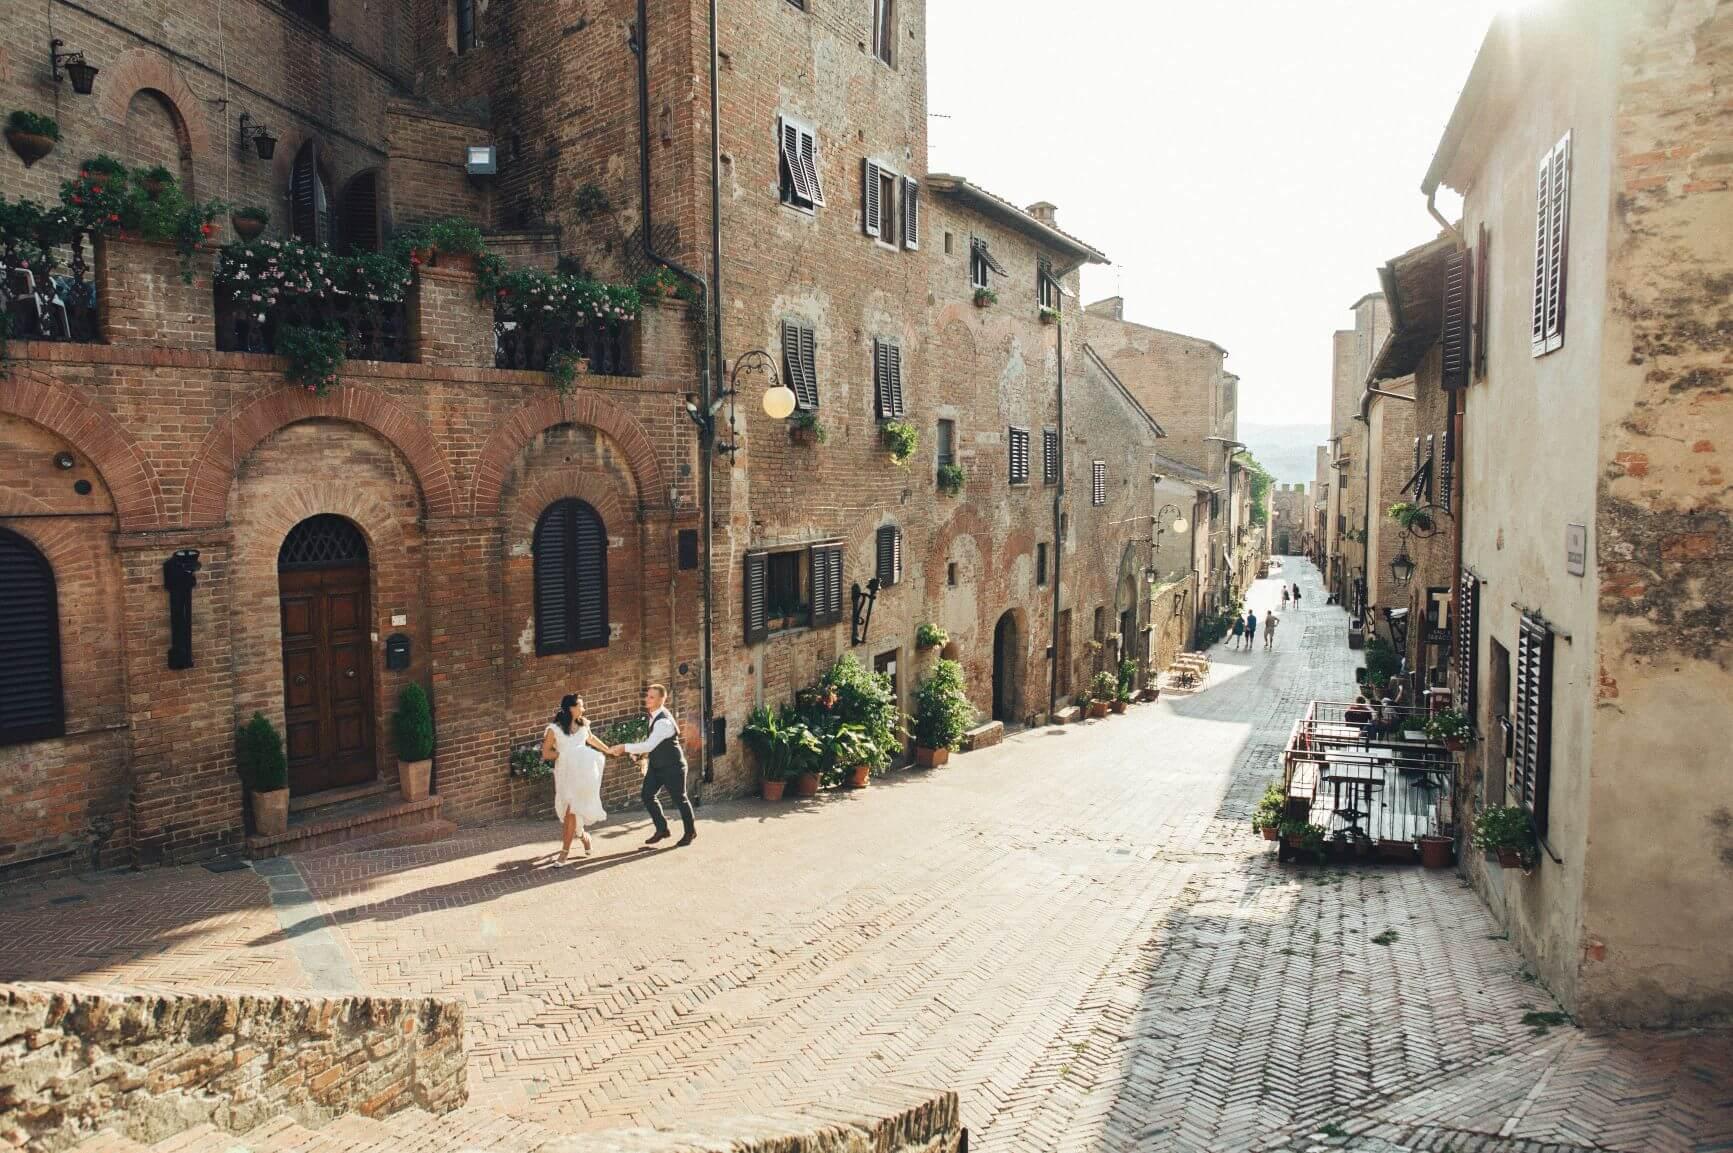 The Best Destination Weddings: #4 France Weddings